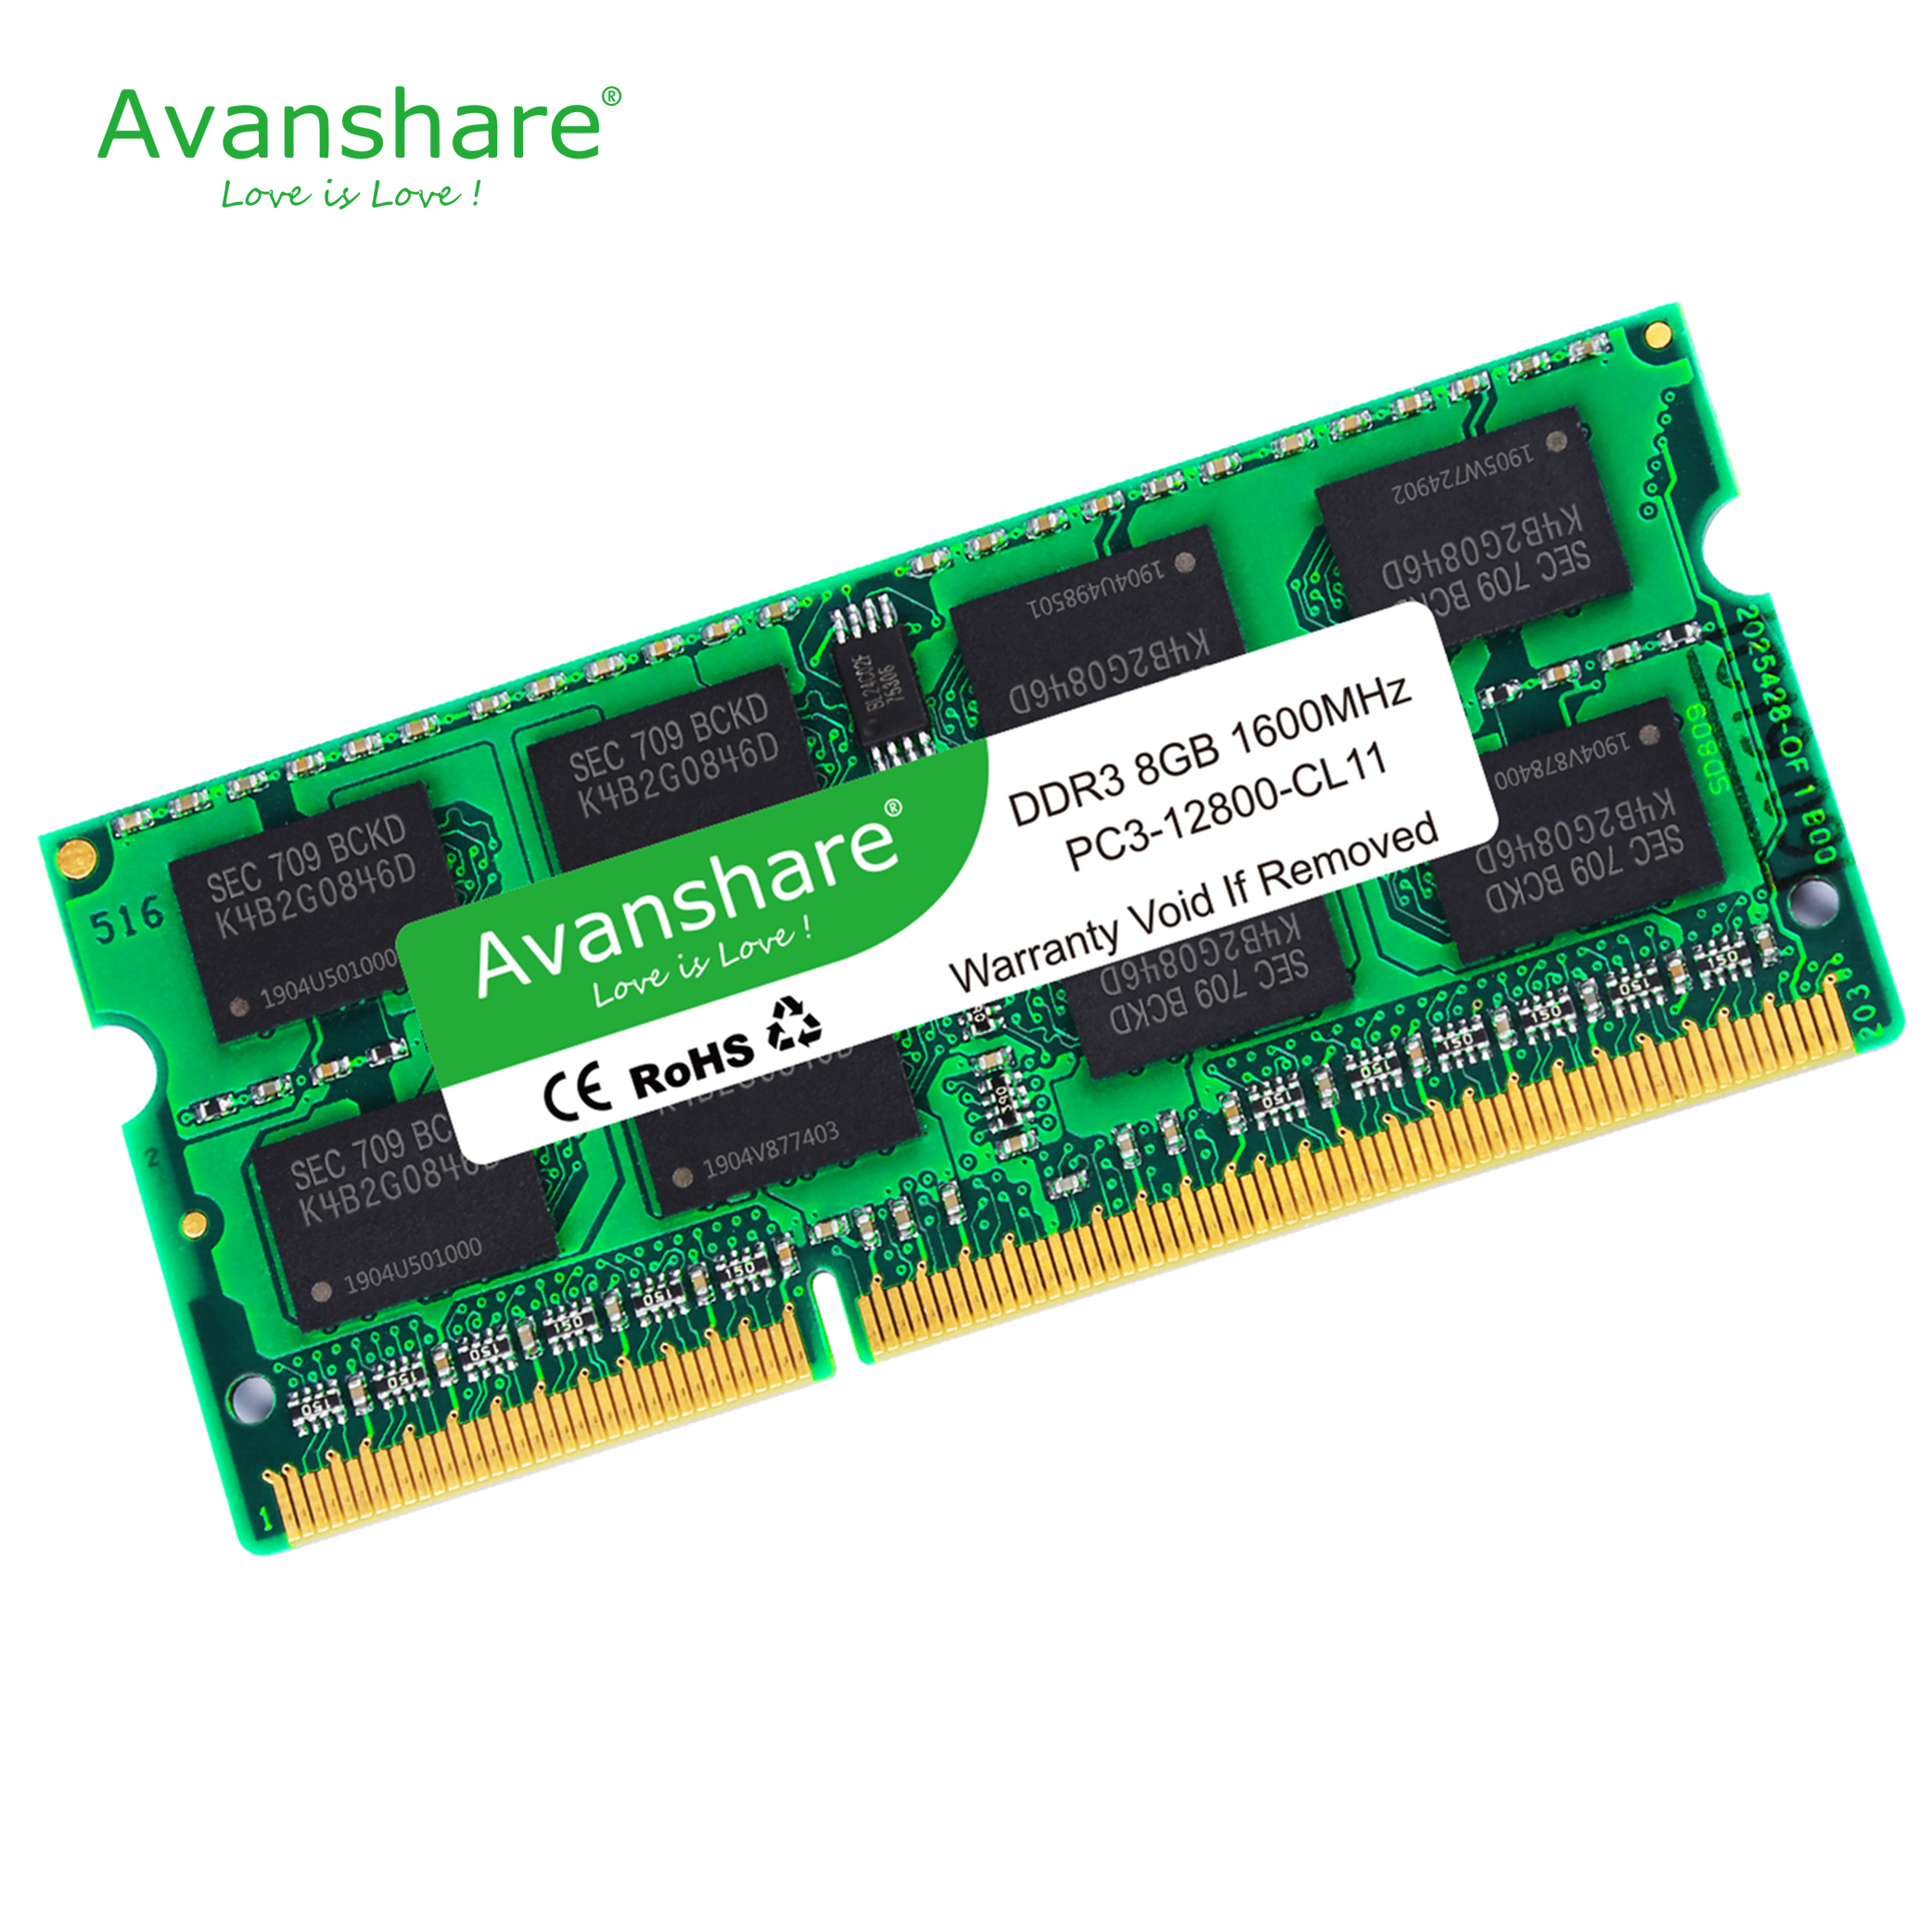 Avanshare 4gb 8gb DDR3 1066 1333 1600 1600mhz 1333mhz 1066mhz SO-DIMM DDR3L DDR3 4GB Memoria sdram de Memória Ram Para O Portátil